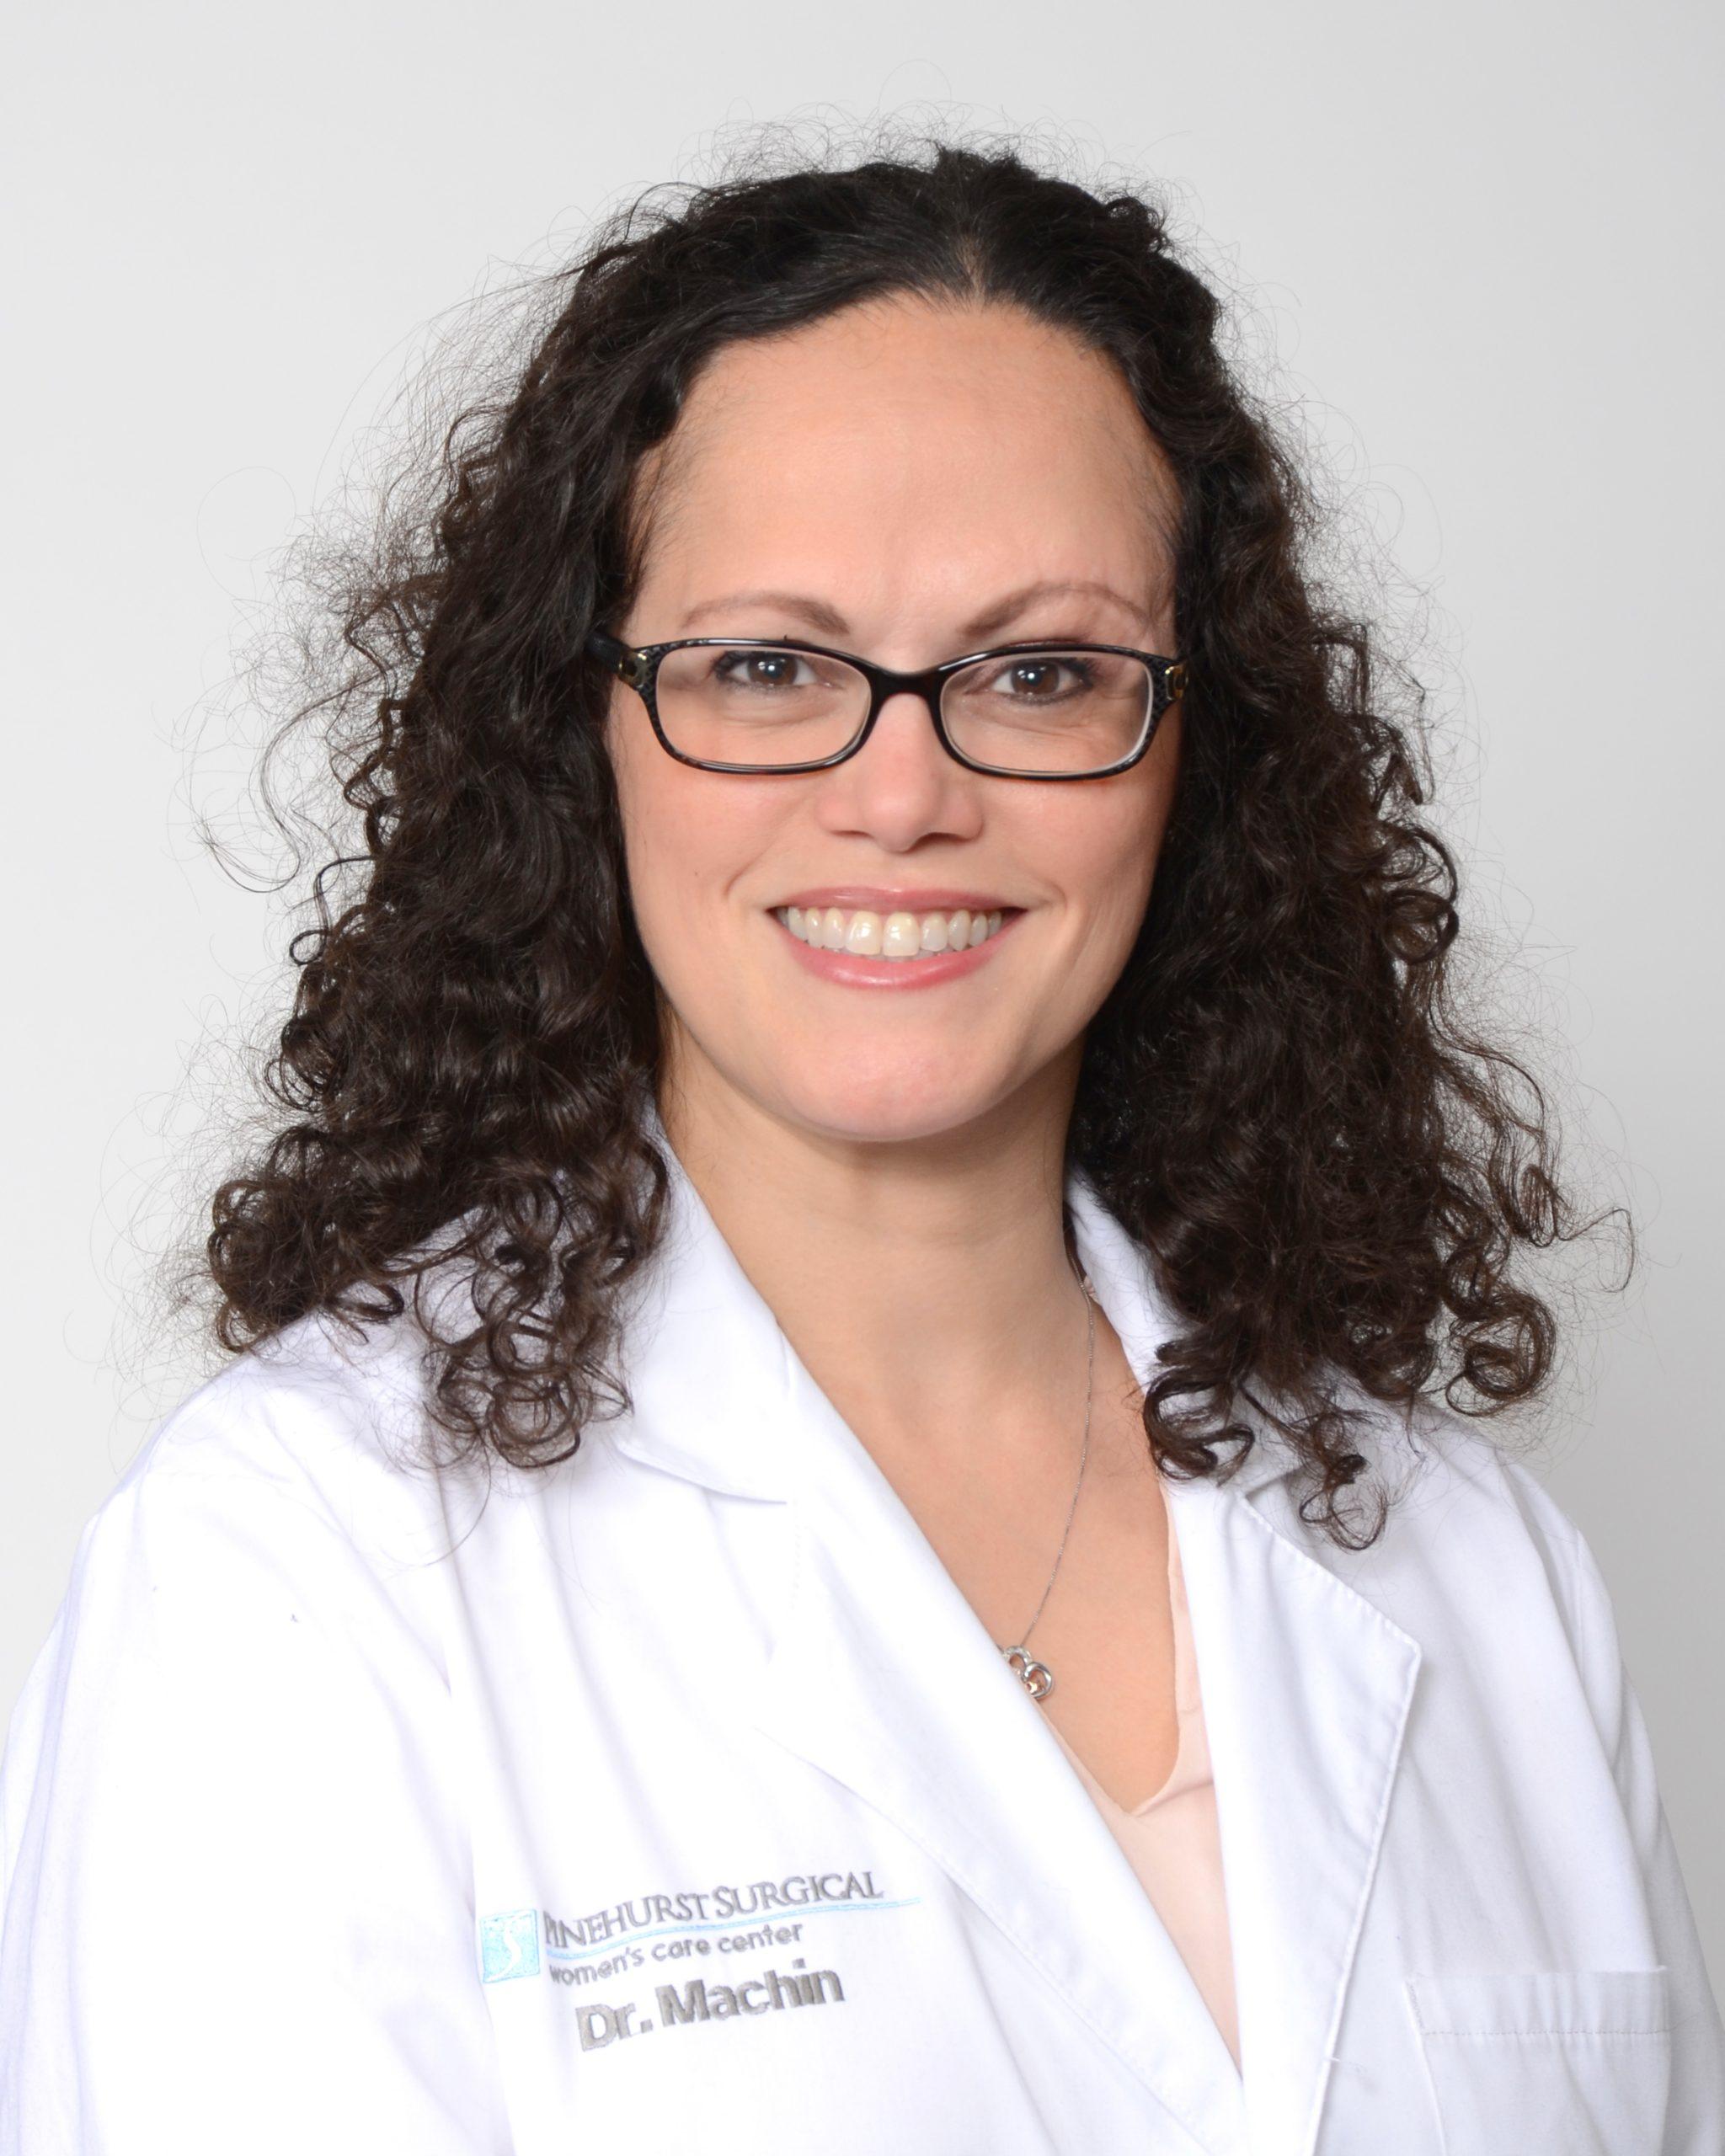 Lissette Machin Women's Comprehensive Health